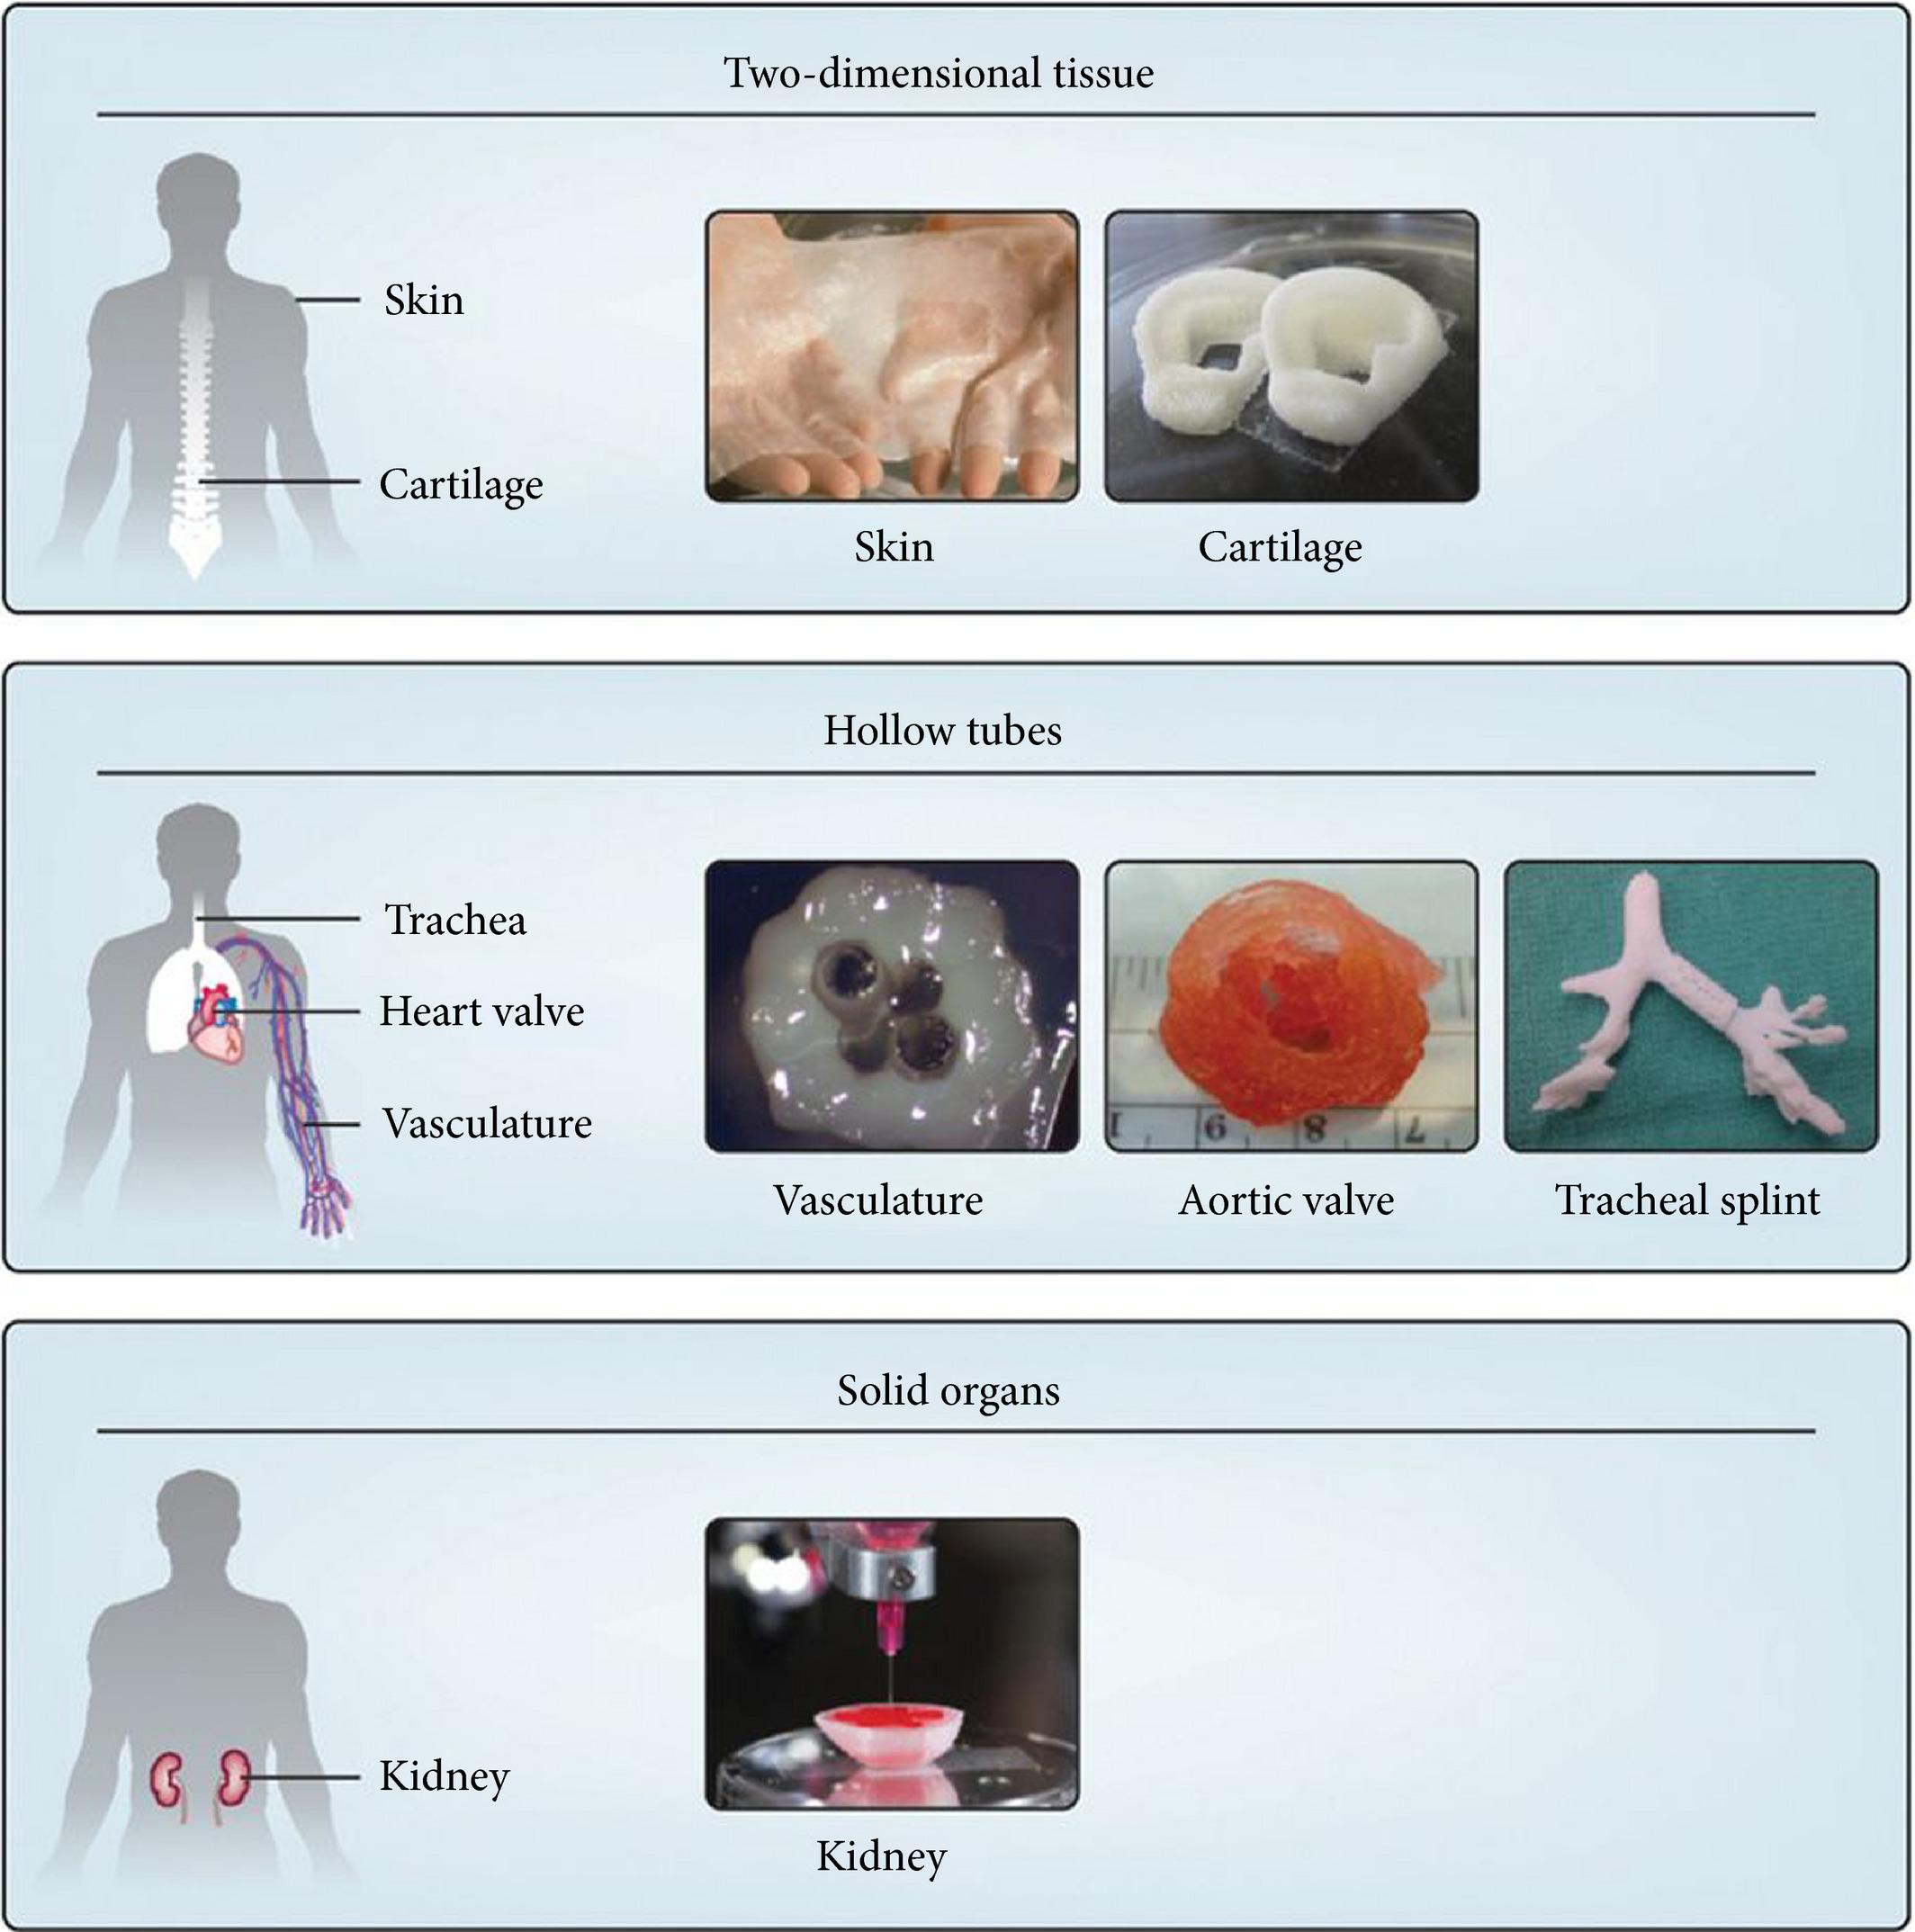 Developments in 3D bioprinting. Image via BJU International.